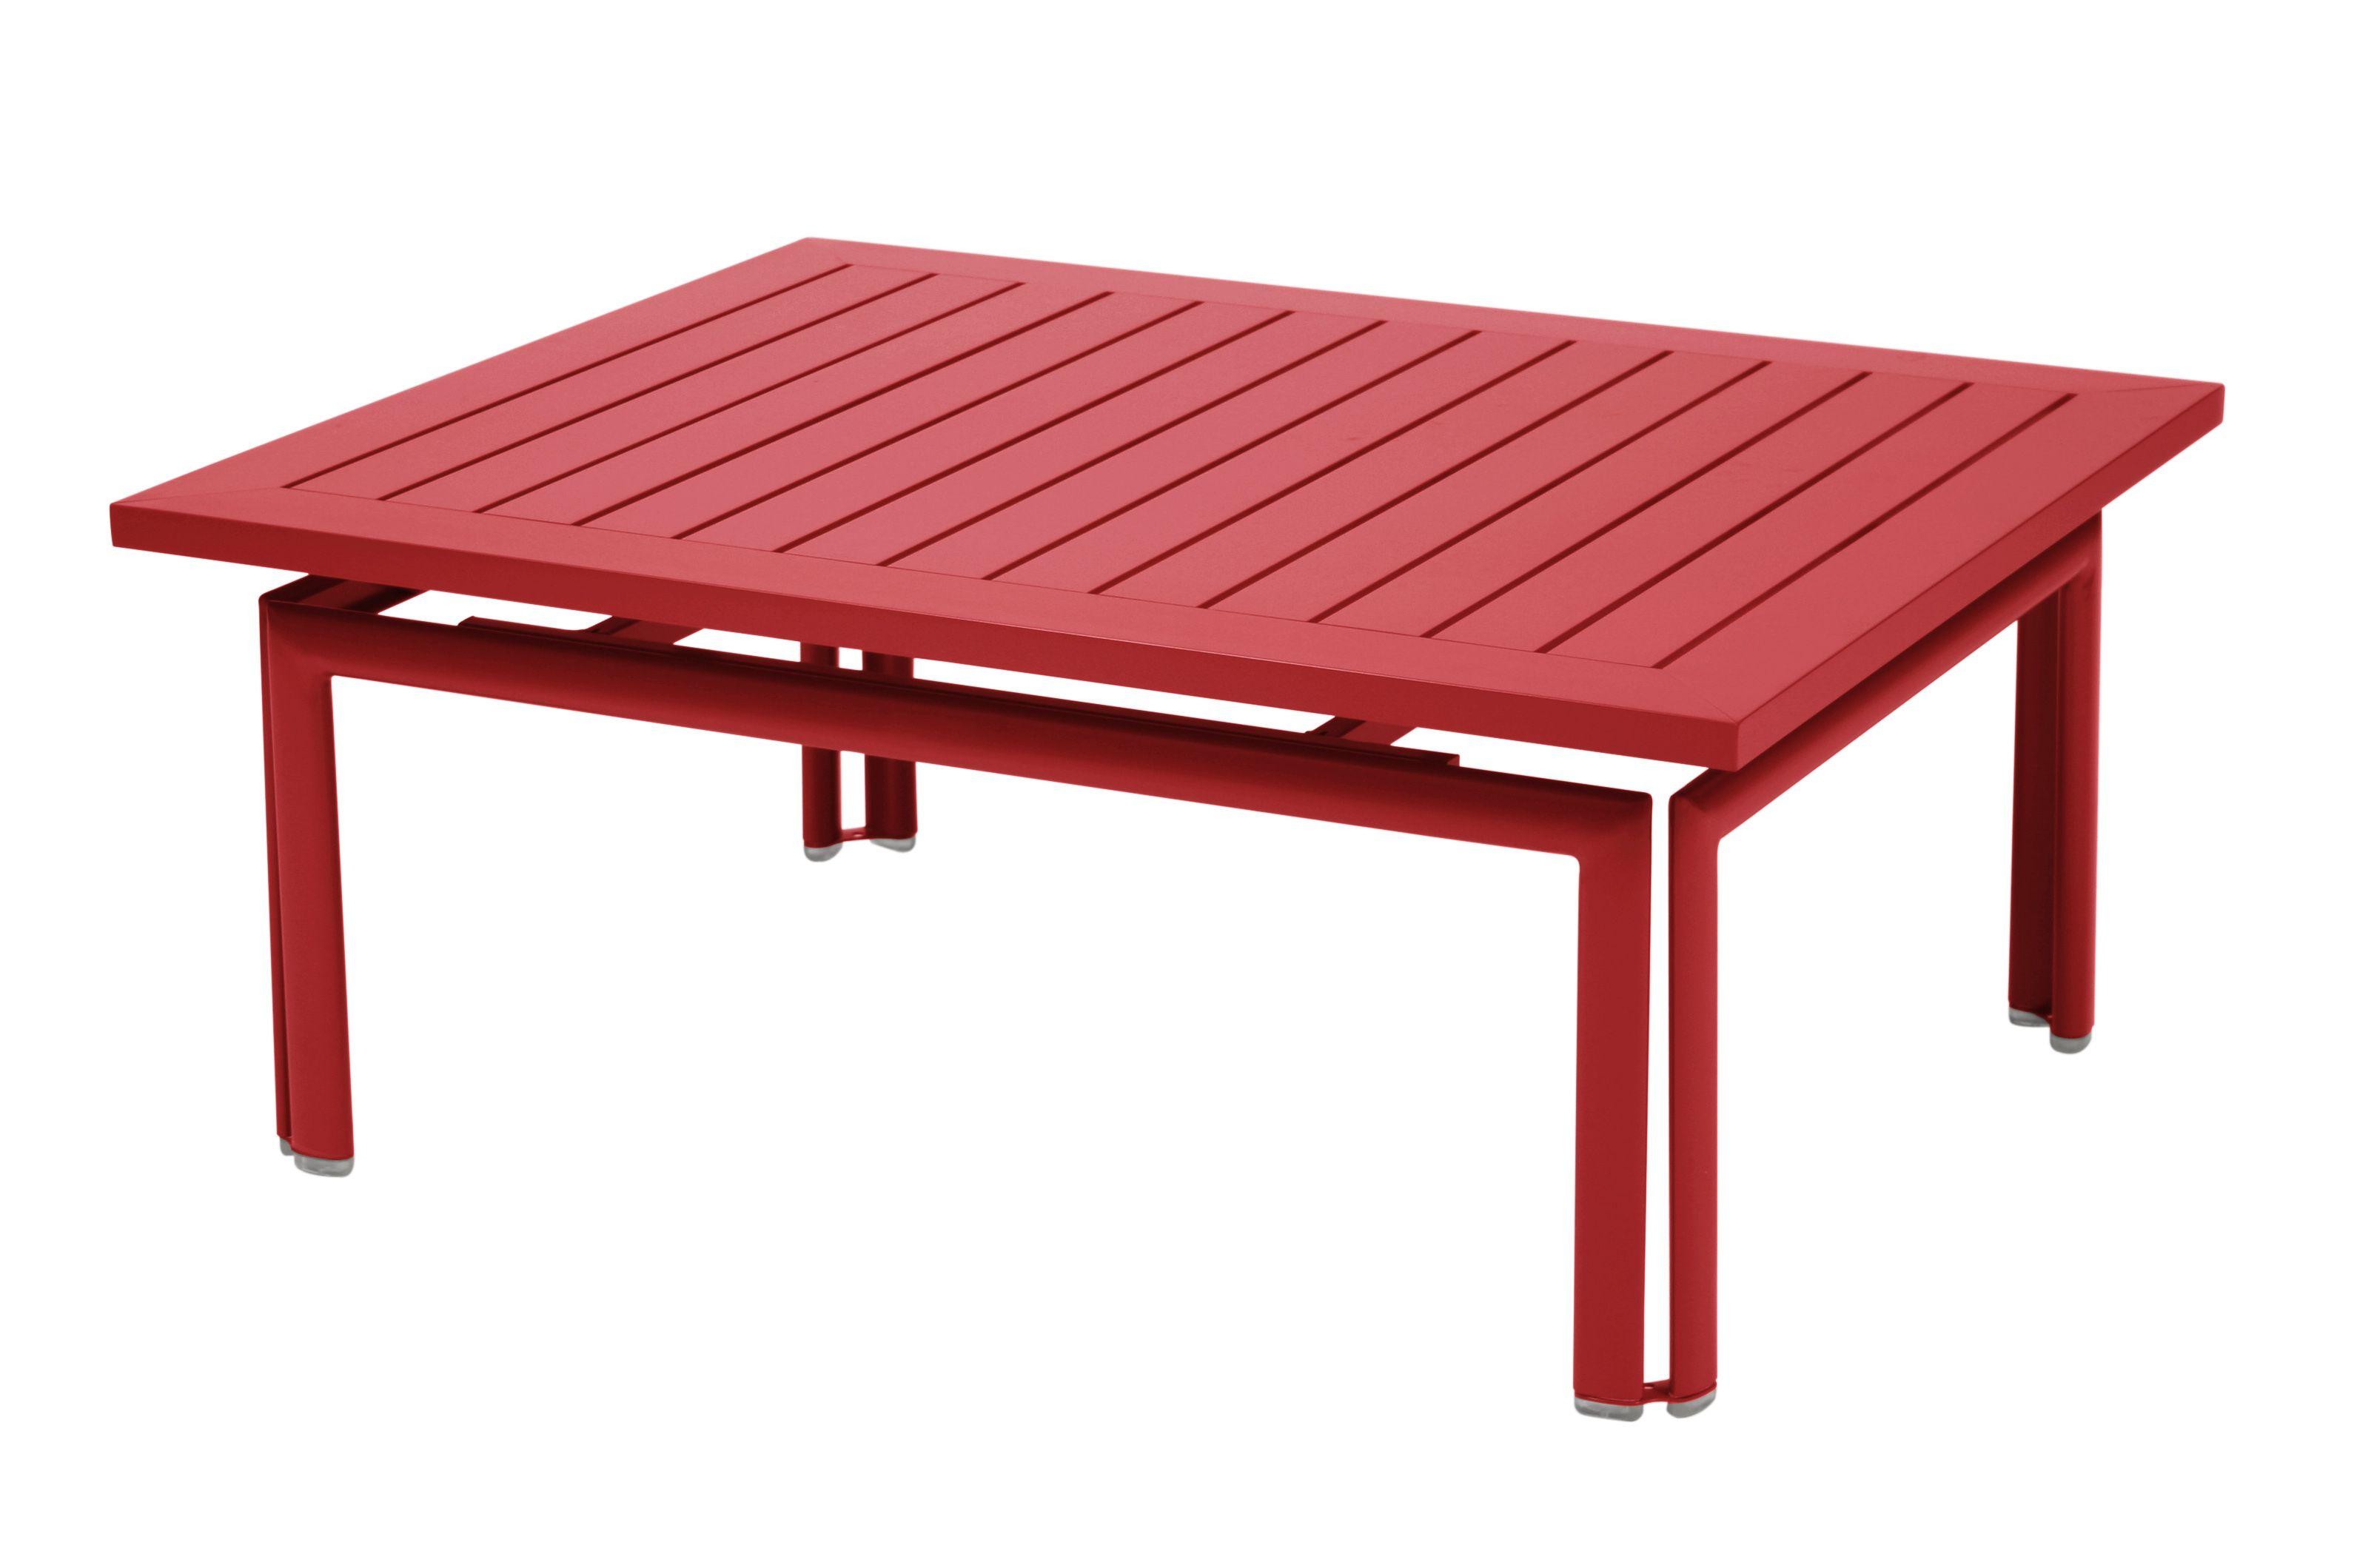 Table basse Costa, table basse pour salon de jardin   COQUELICOT ...